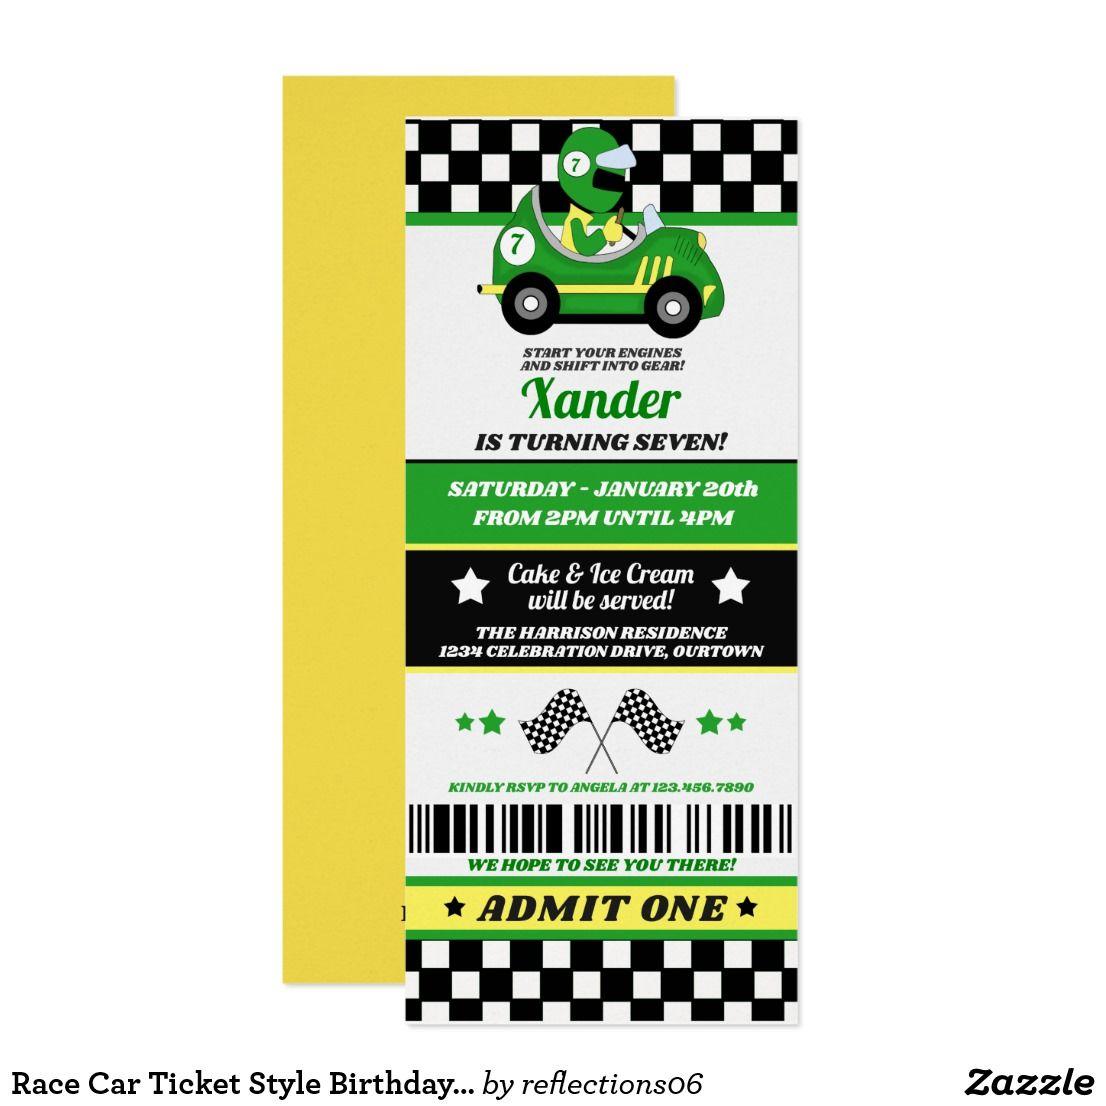 Race Car Ticket Style Birthday Party Invitation | Race car themes ...